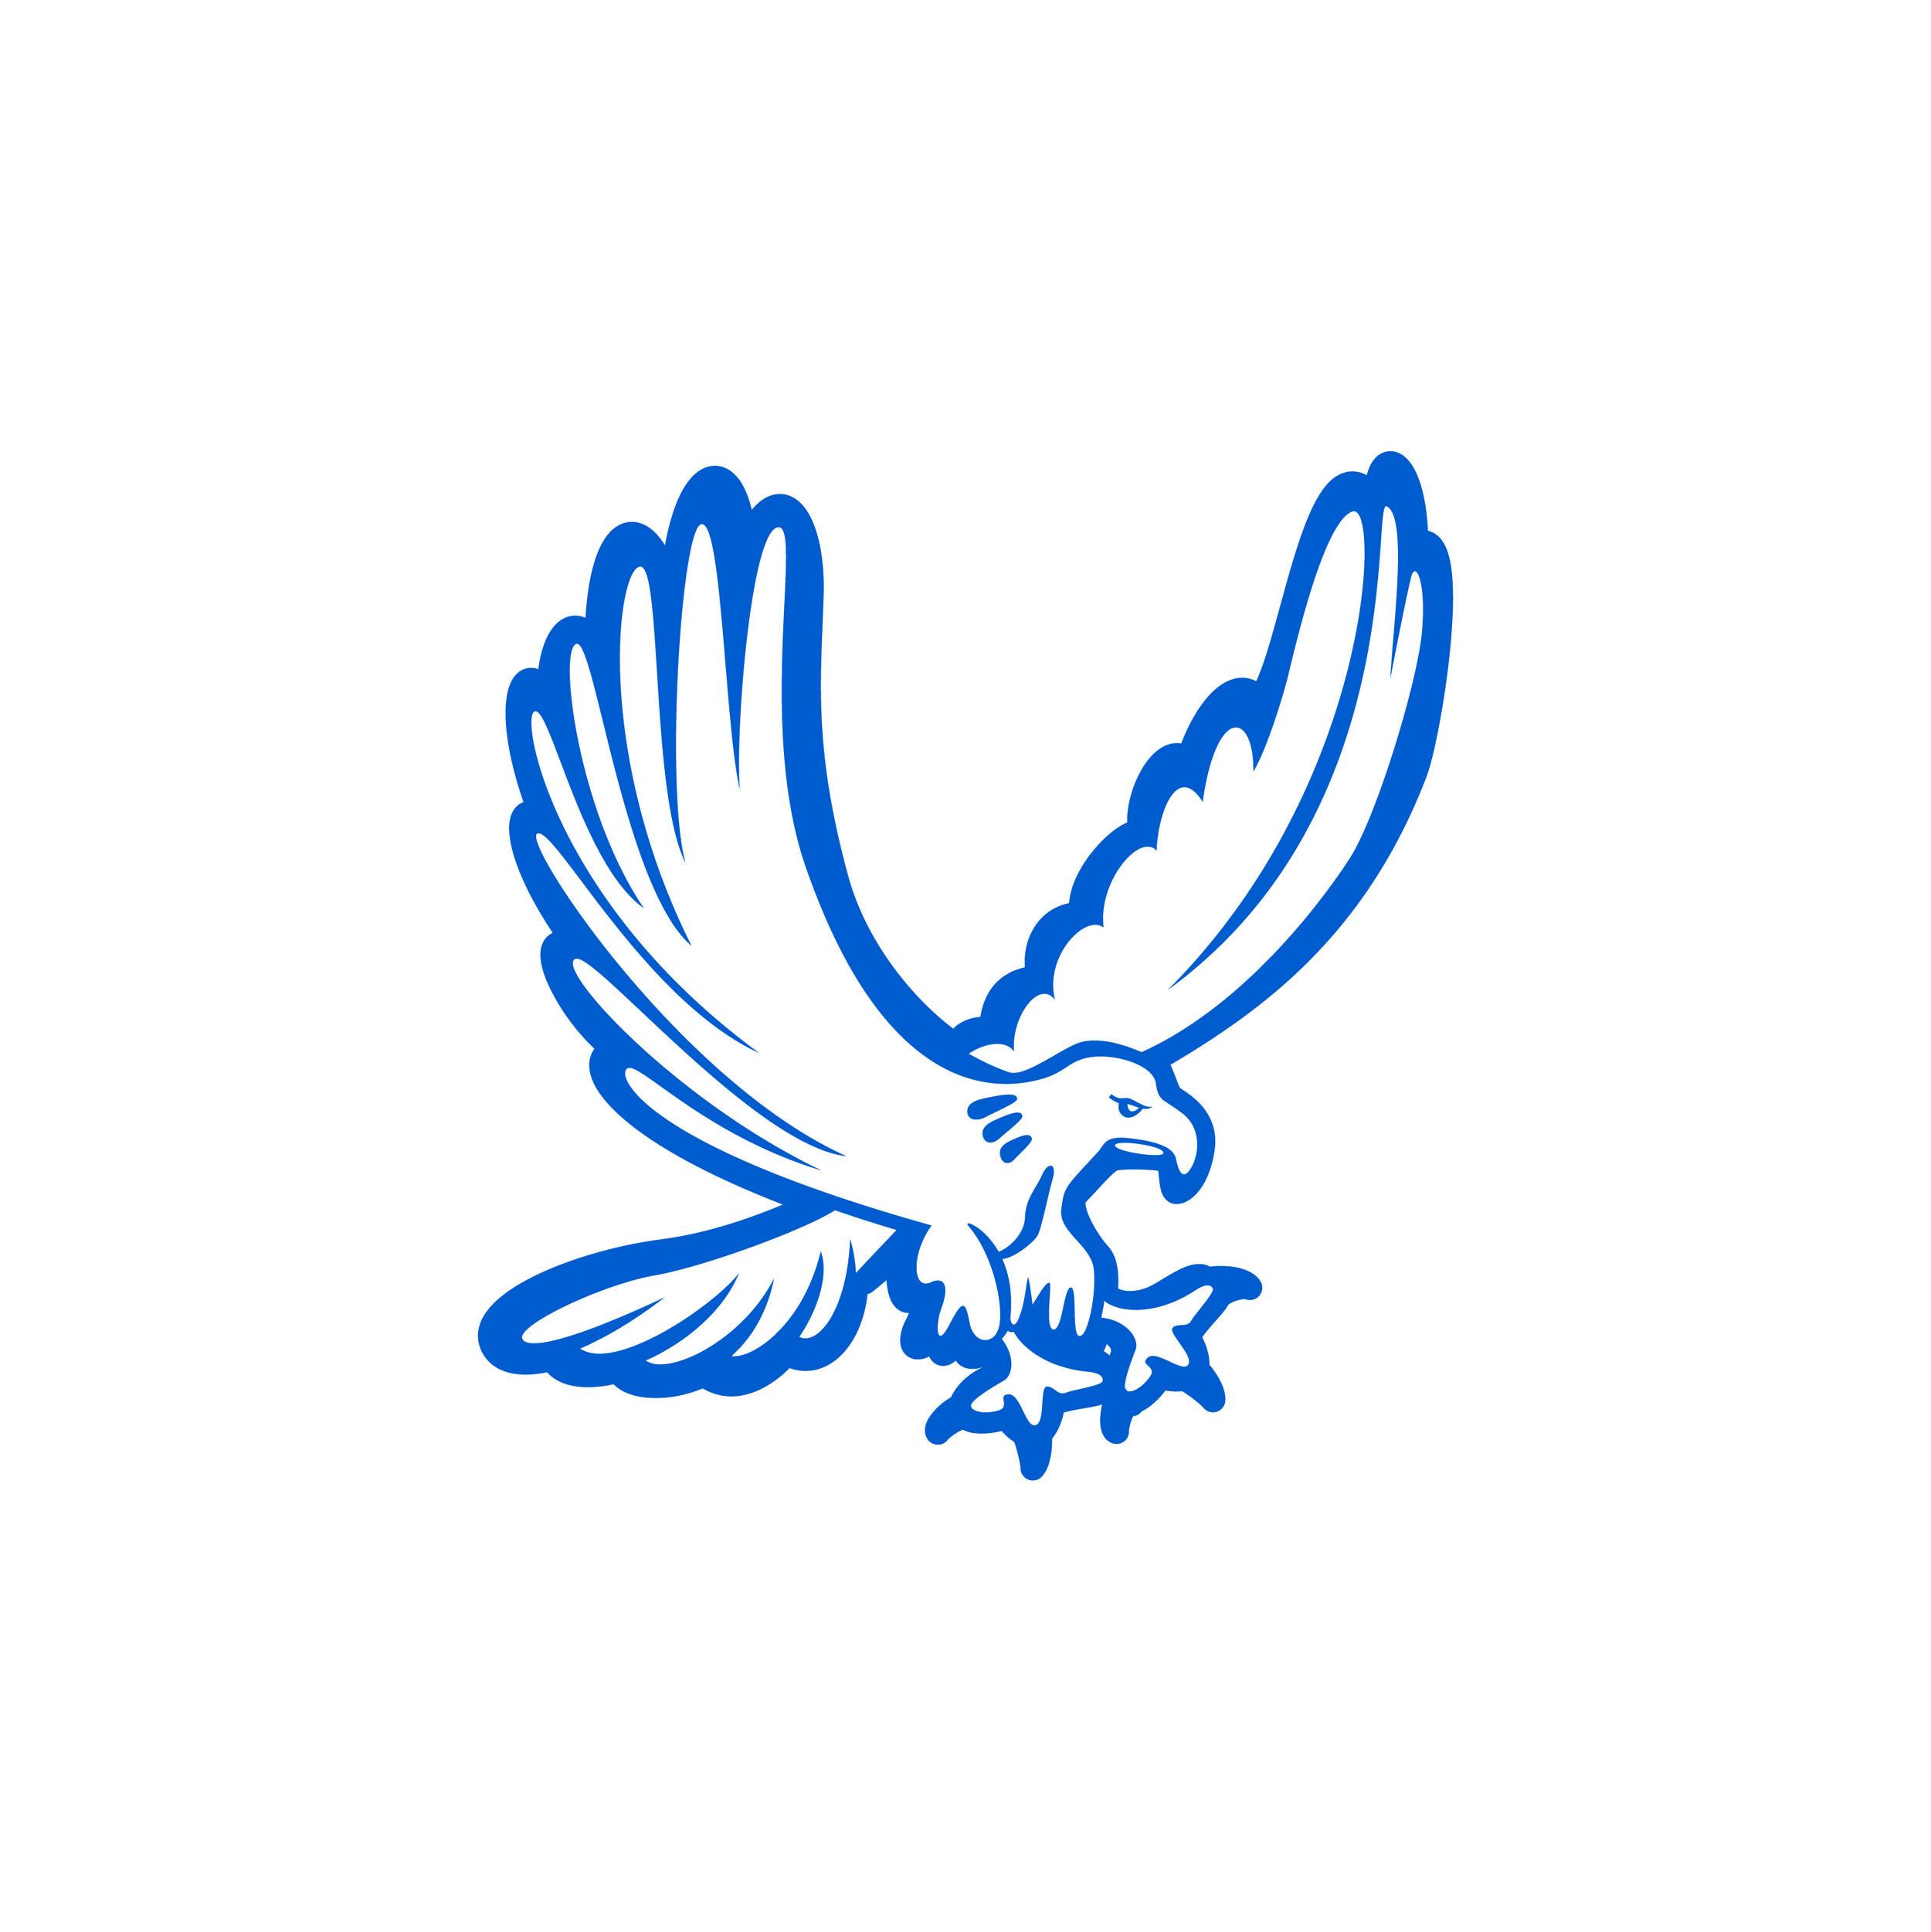 The Cooper Eagle